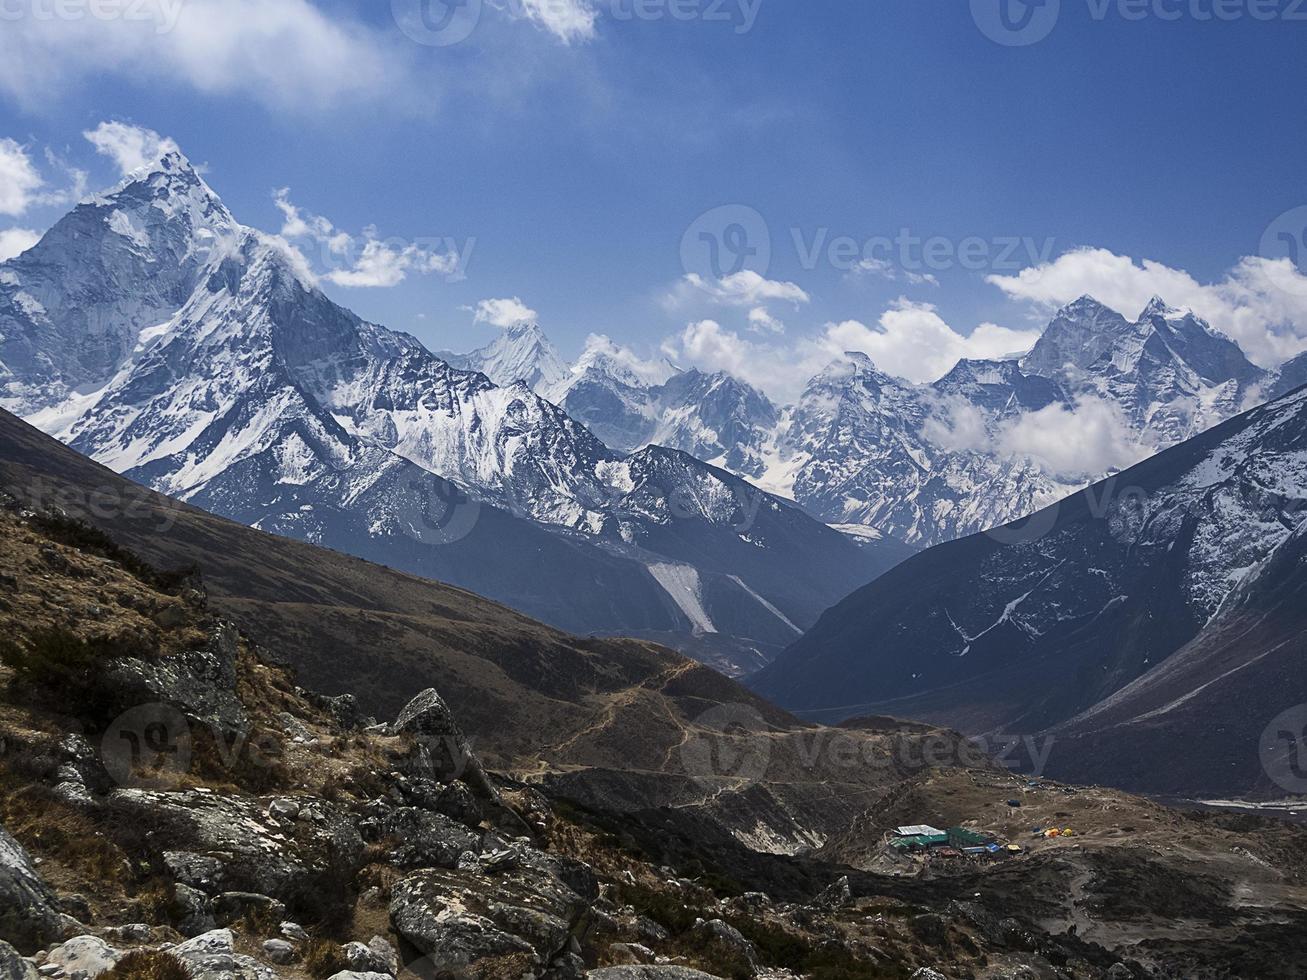 världens tak - himalaya mountain vista foto